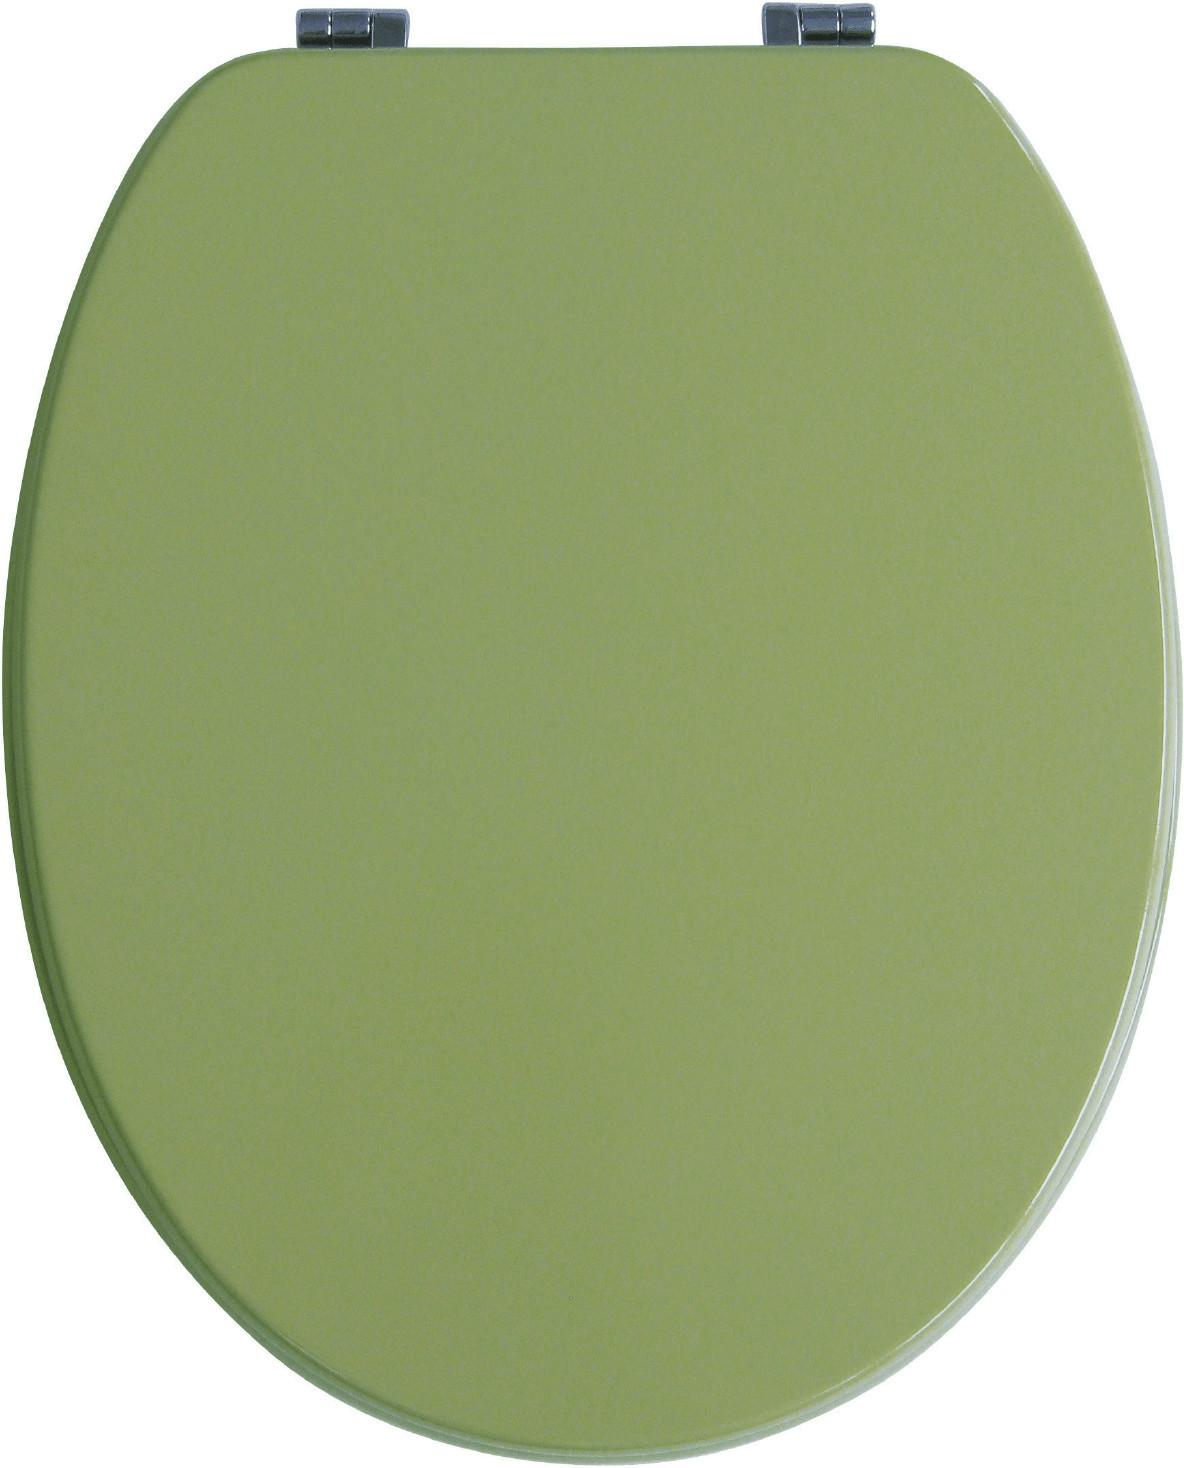 Sanitop Venezia oliv (21909 9)